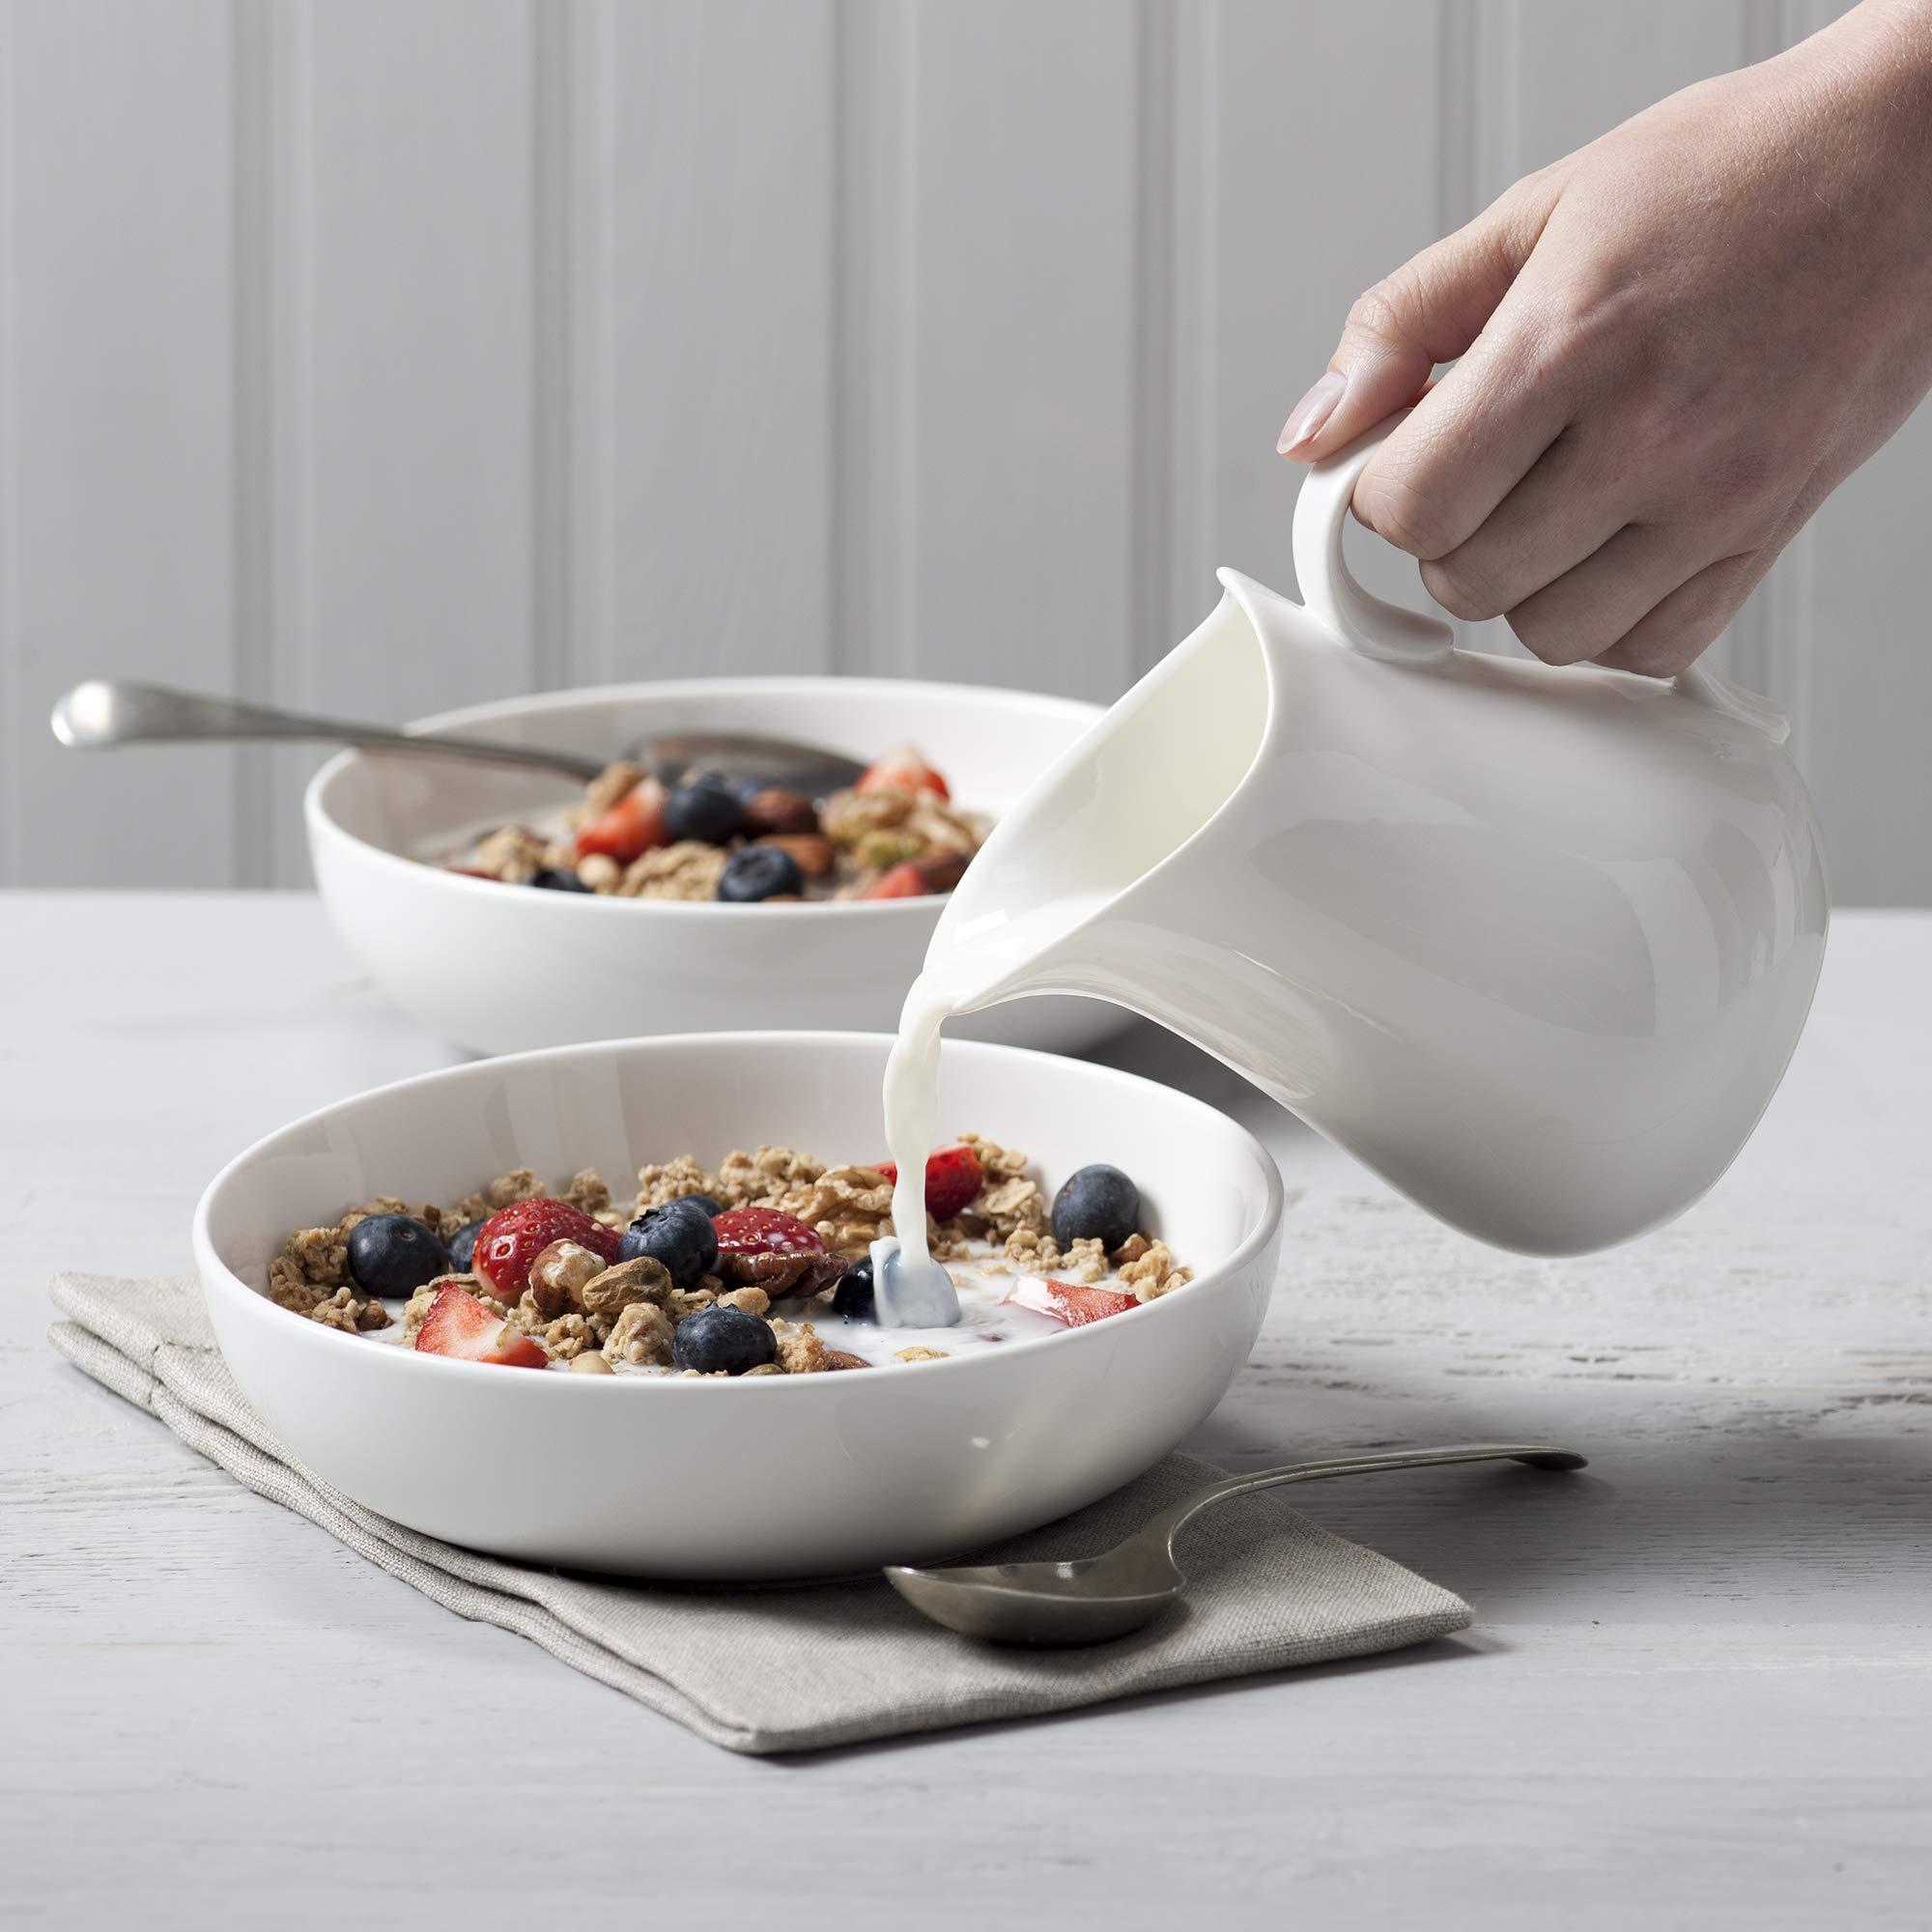 Wm Bartleet /& Sons White Porcelain Traditional Jug 450 ml /¾ pint